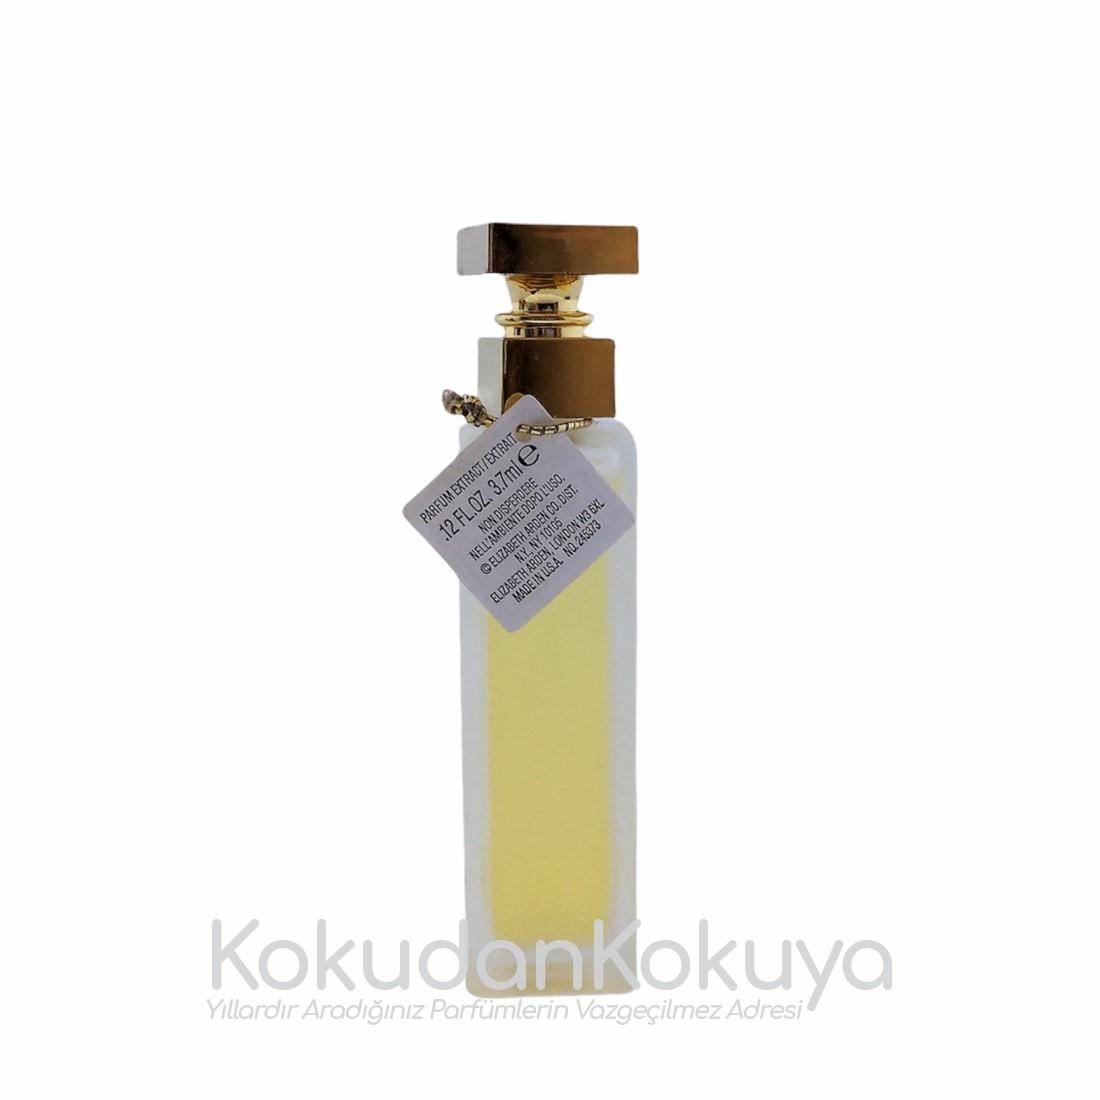 ELIZABETH ARDEN 5th Avenue (Vintage) Parfüm Kadın 3.75ml Saf Parfüm  Dökme